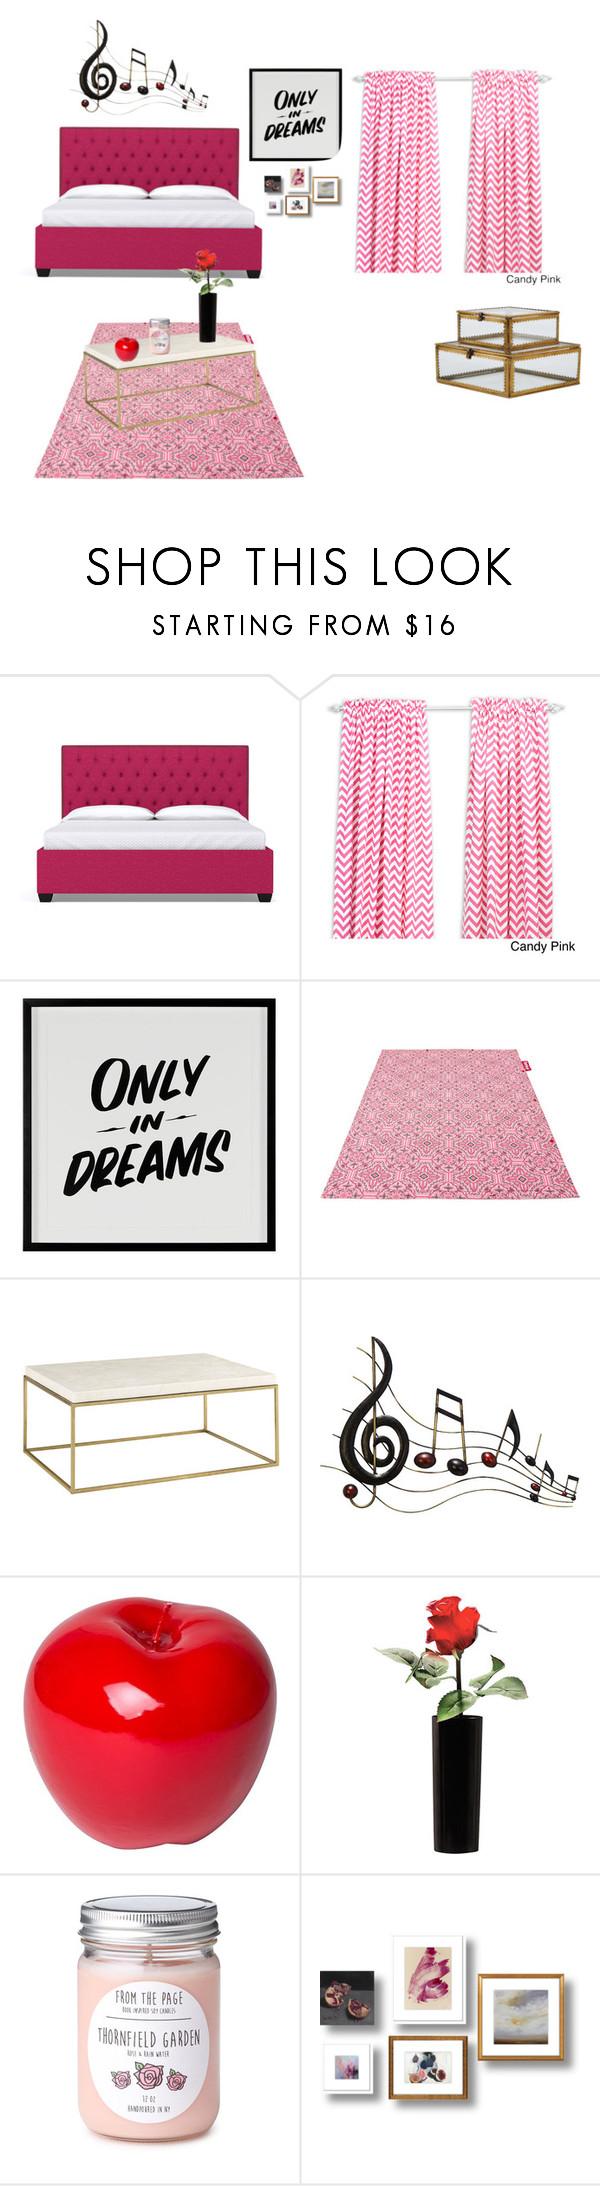 """dream bedroom"" by jayden5409 ❤ liked on Polyvore featuring interior, interiors, interior design, home, home decor, interior decorating, Baron Von Fancy, Fatboy, Benzara and Bitossi"